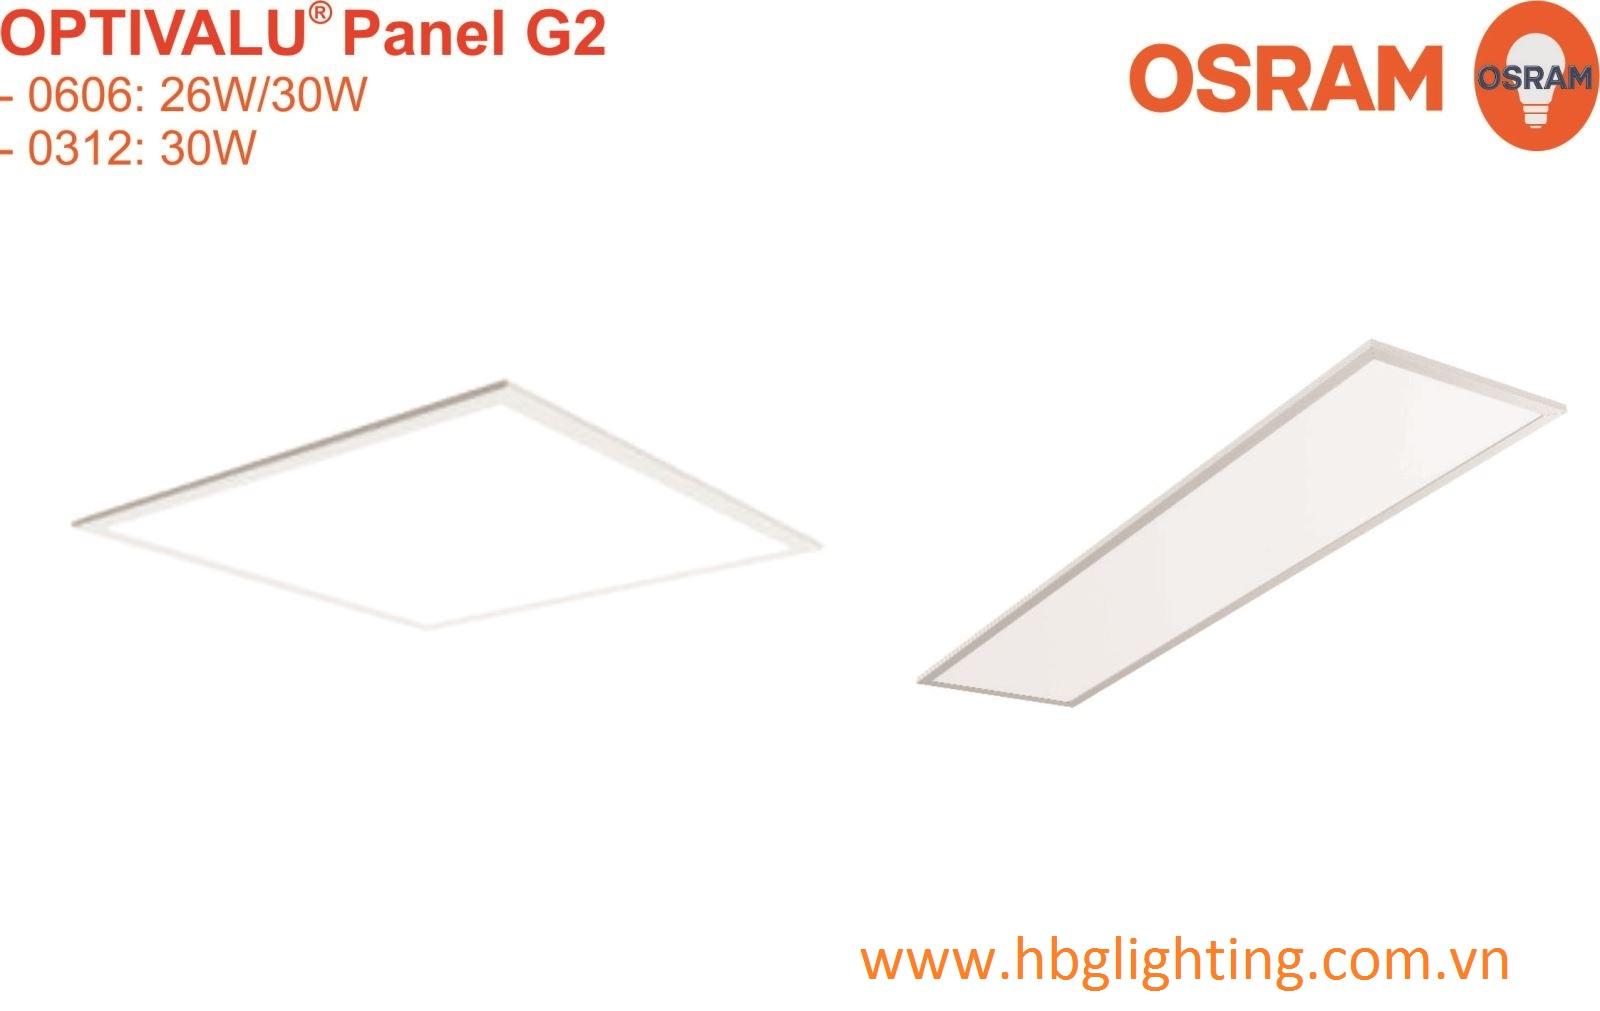 OPTIVALU PANEL G2 0606 OSRAM